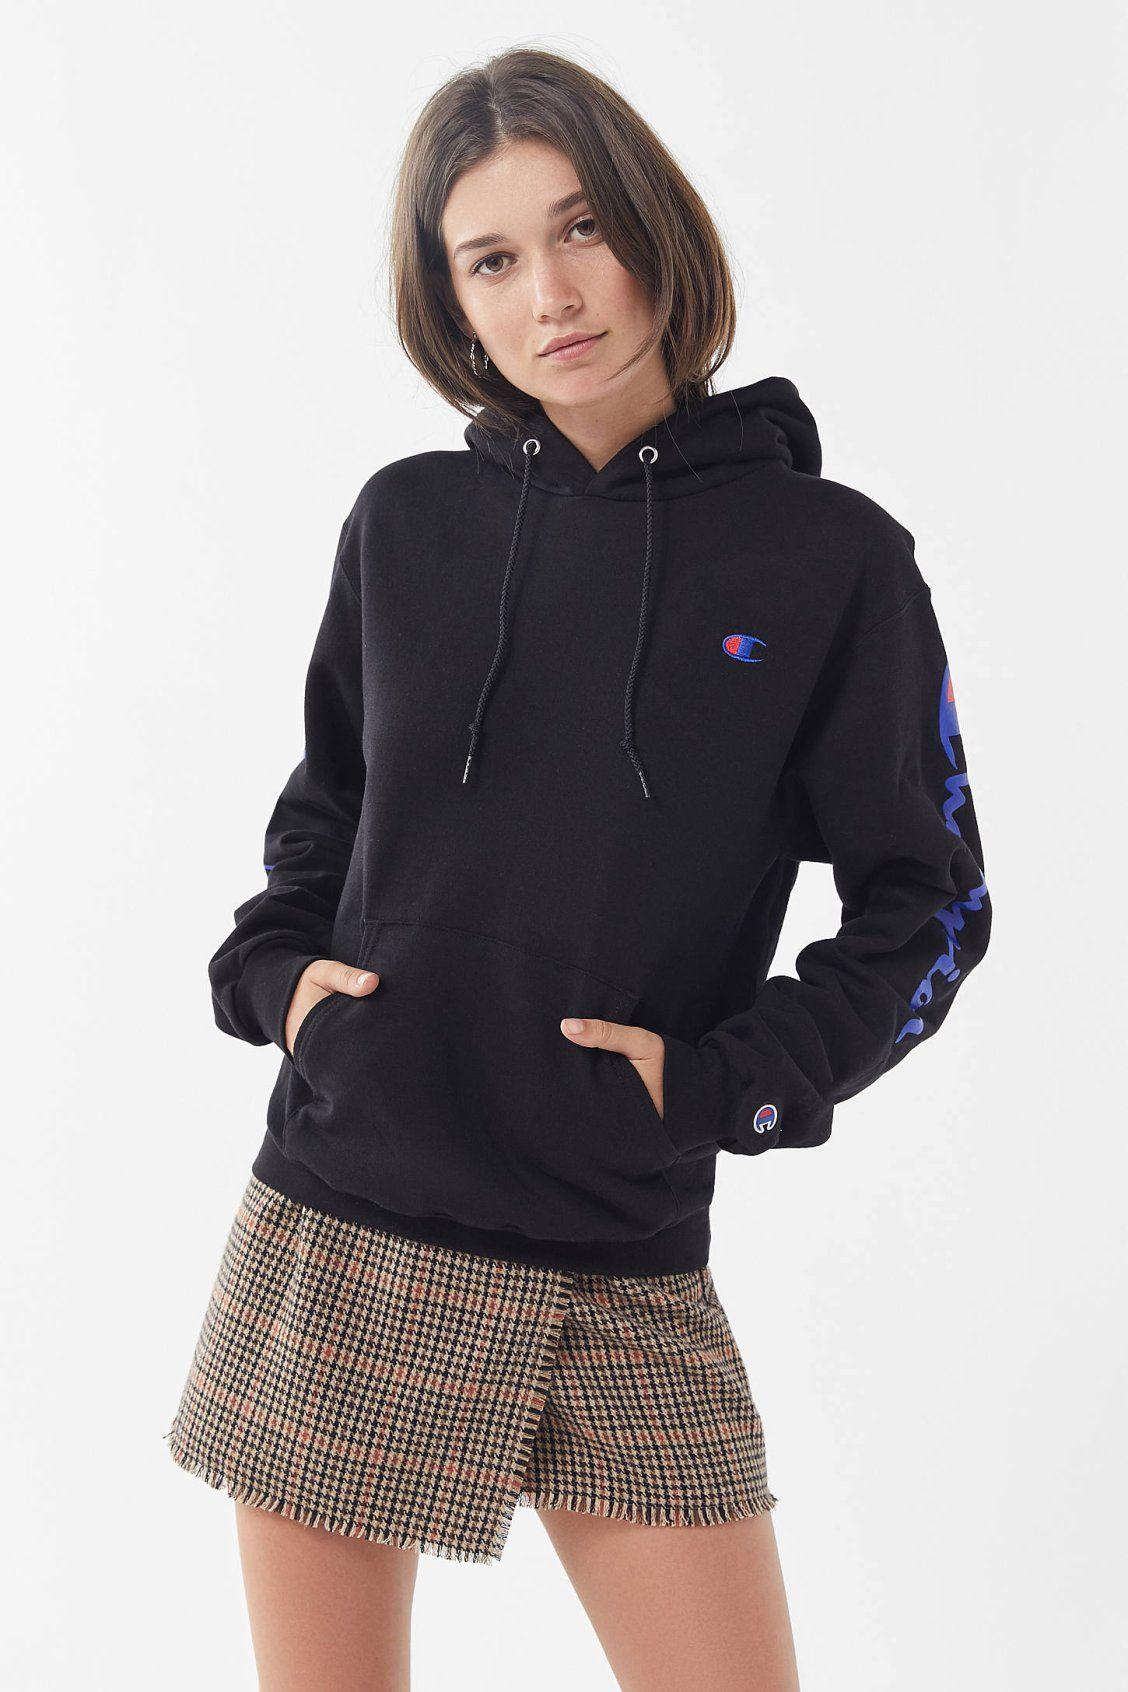 8f6a86f3f801d Champion   UO Pullover Hoodie Sweatshirt